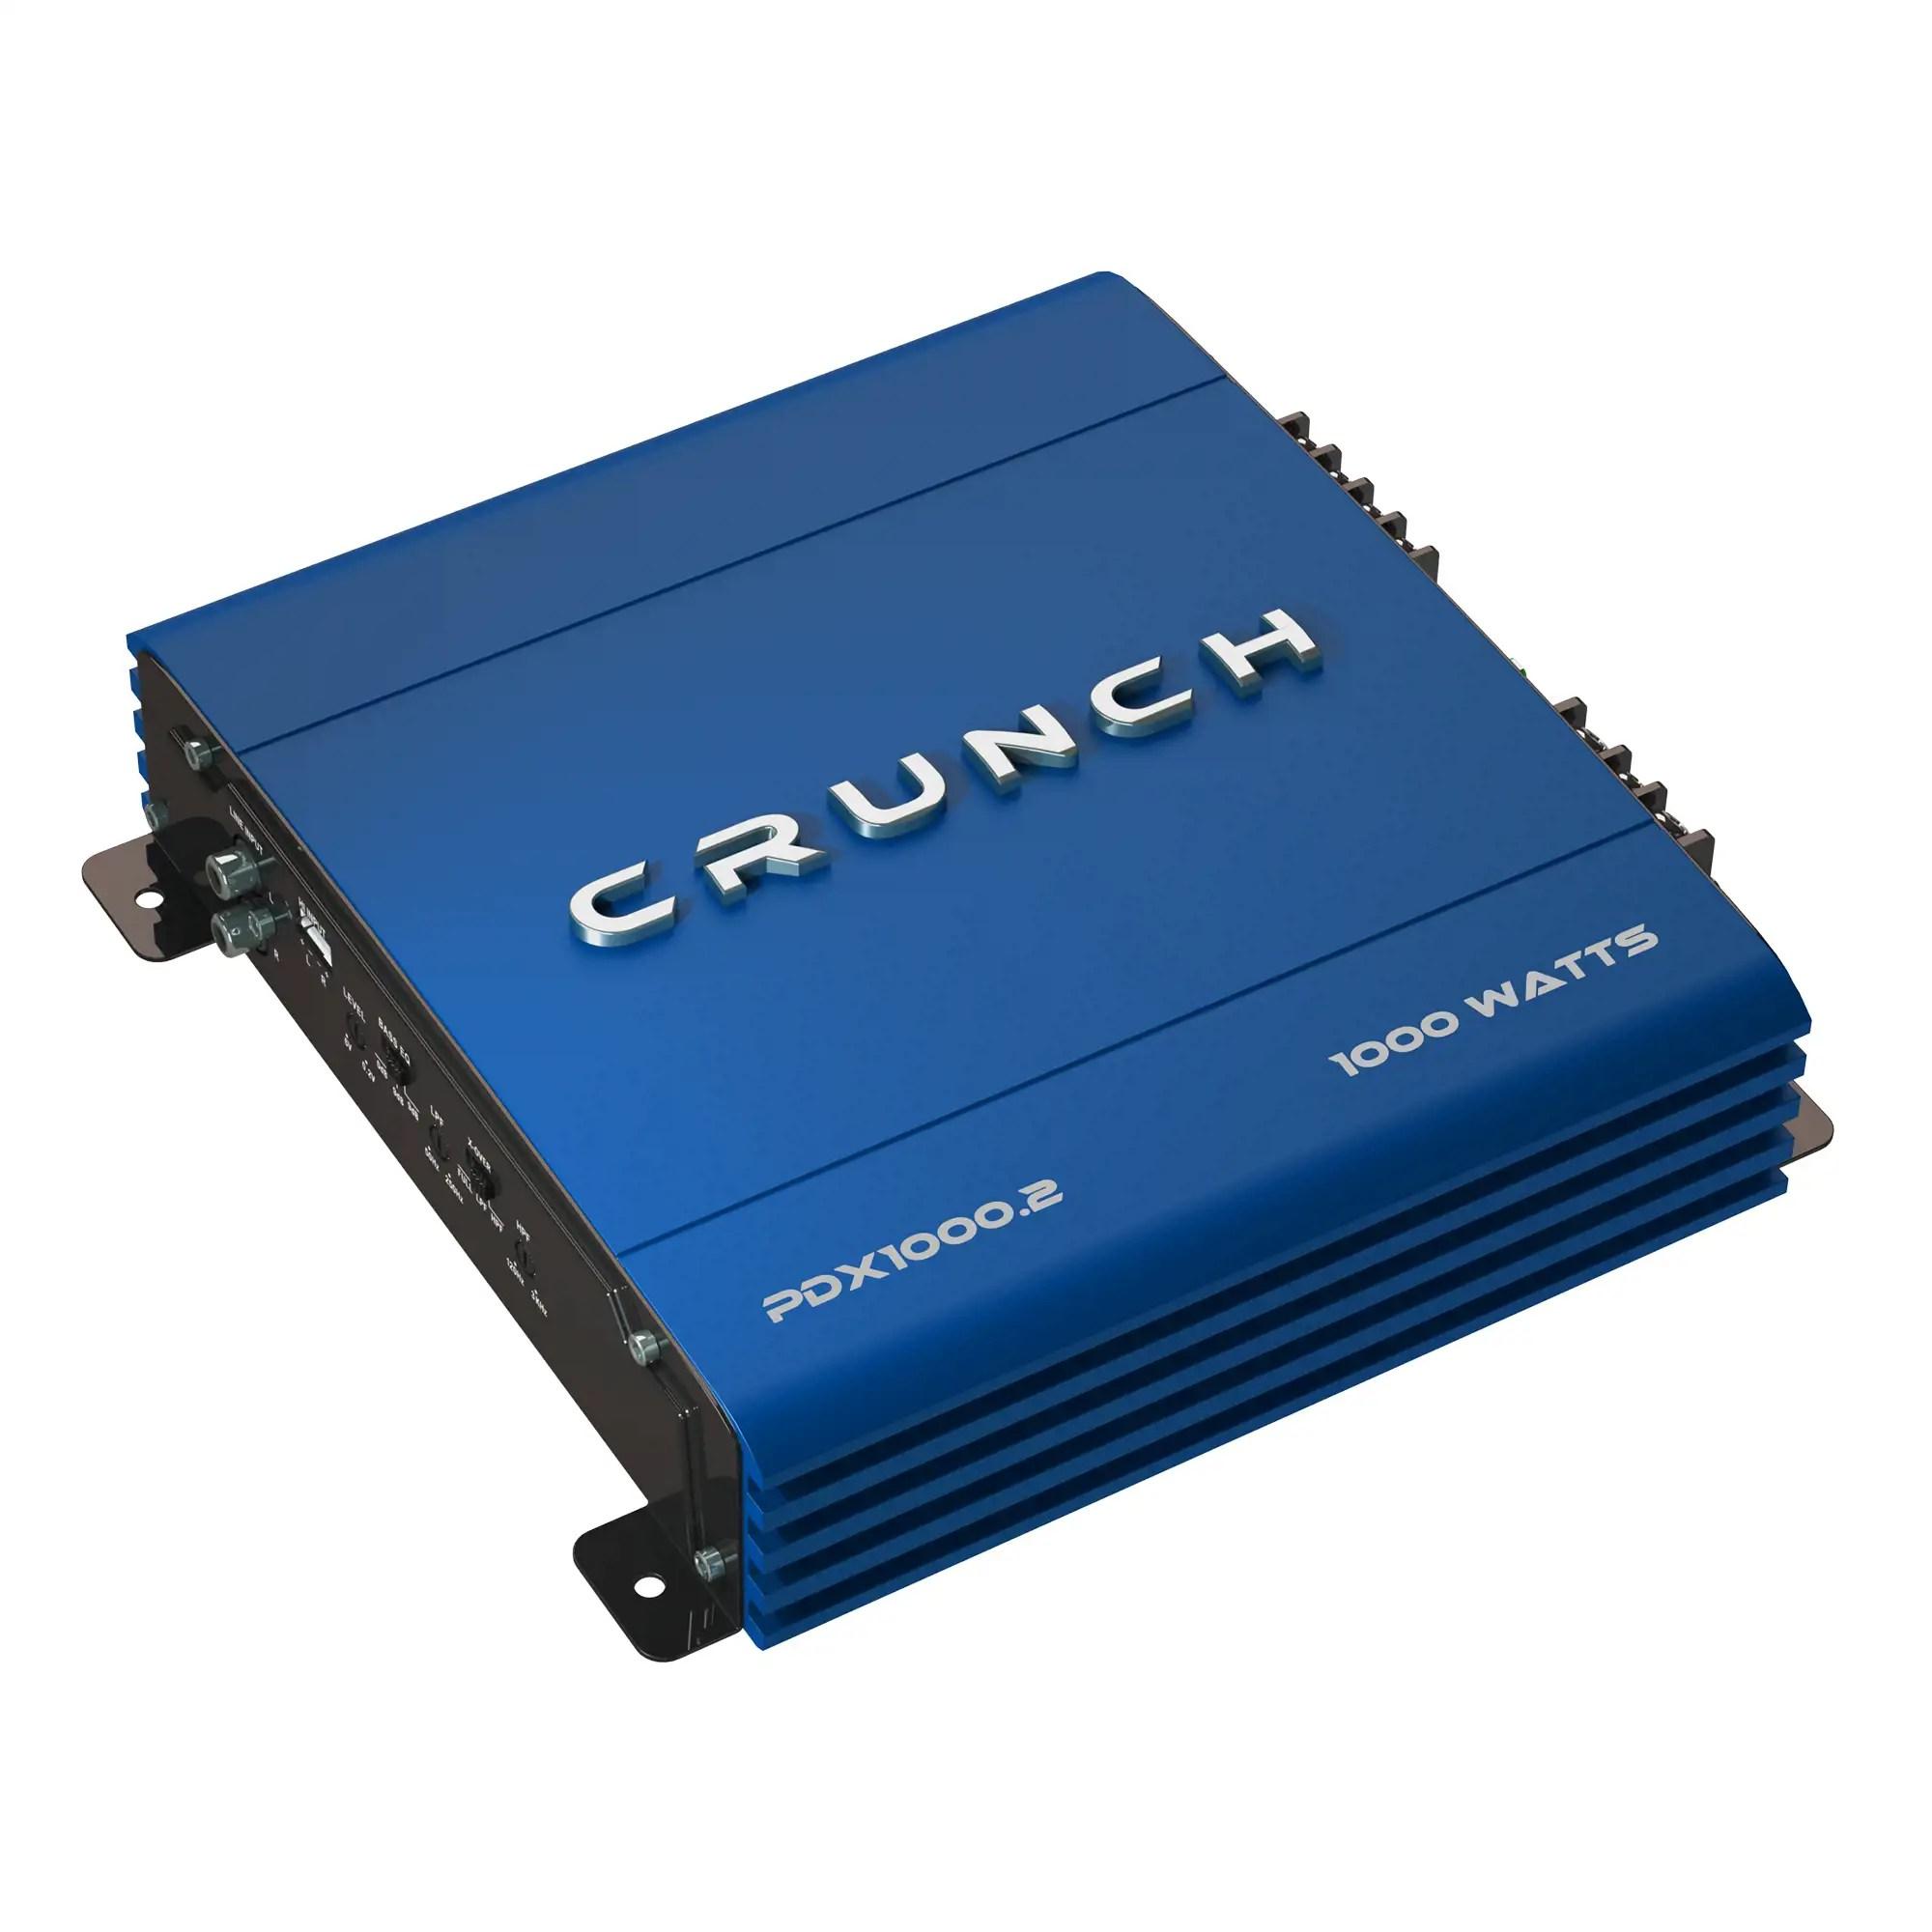 2 channel stereo amplifier 98 explorer radio wiring diagram crunch 1000 watt exclusive blue a b car